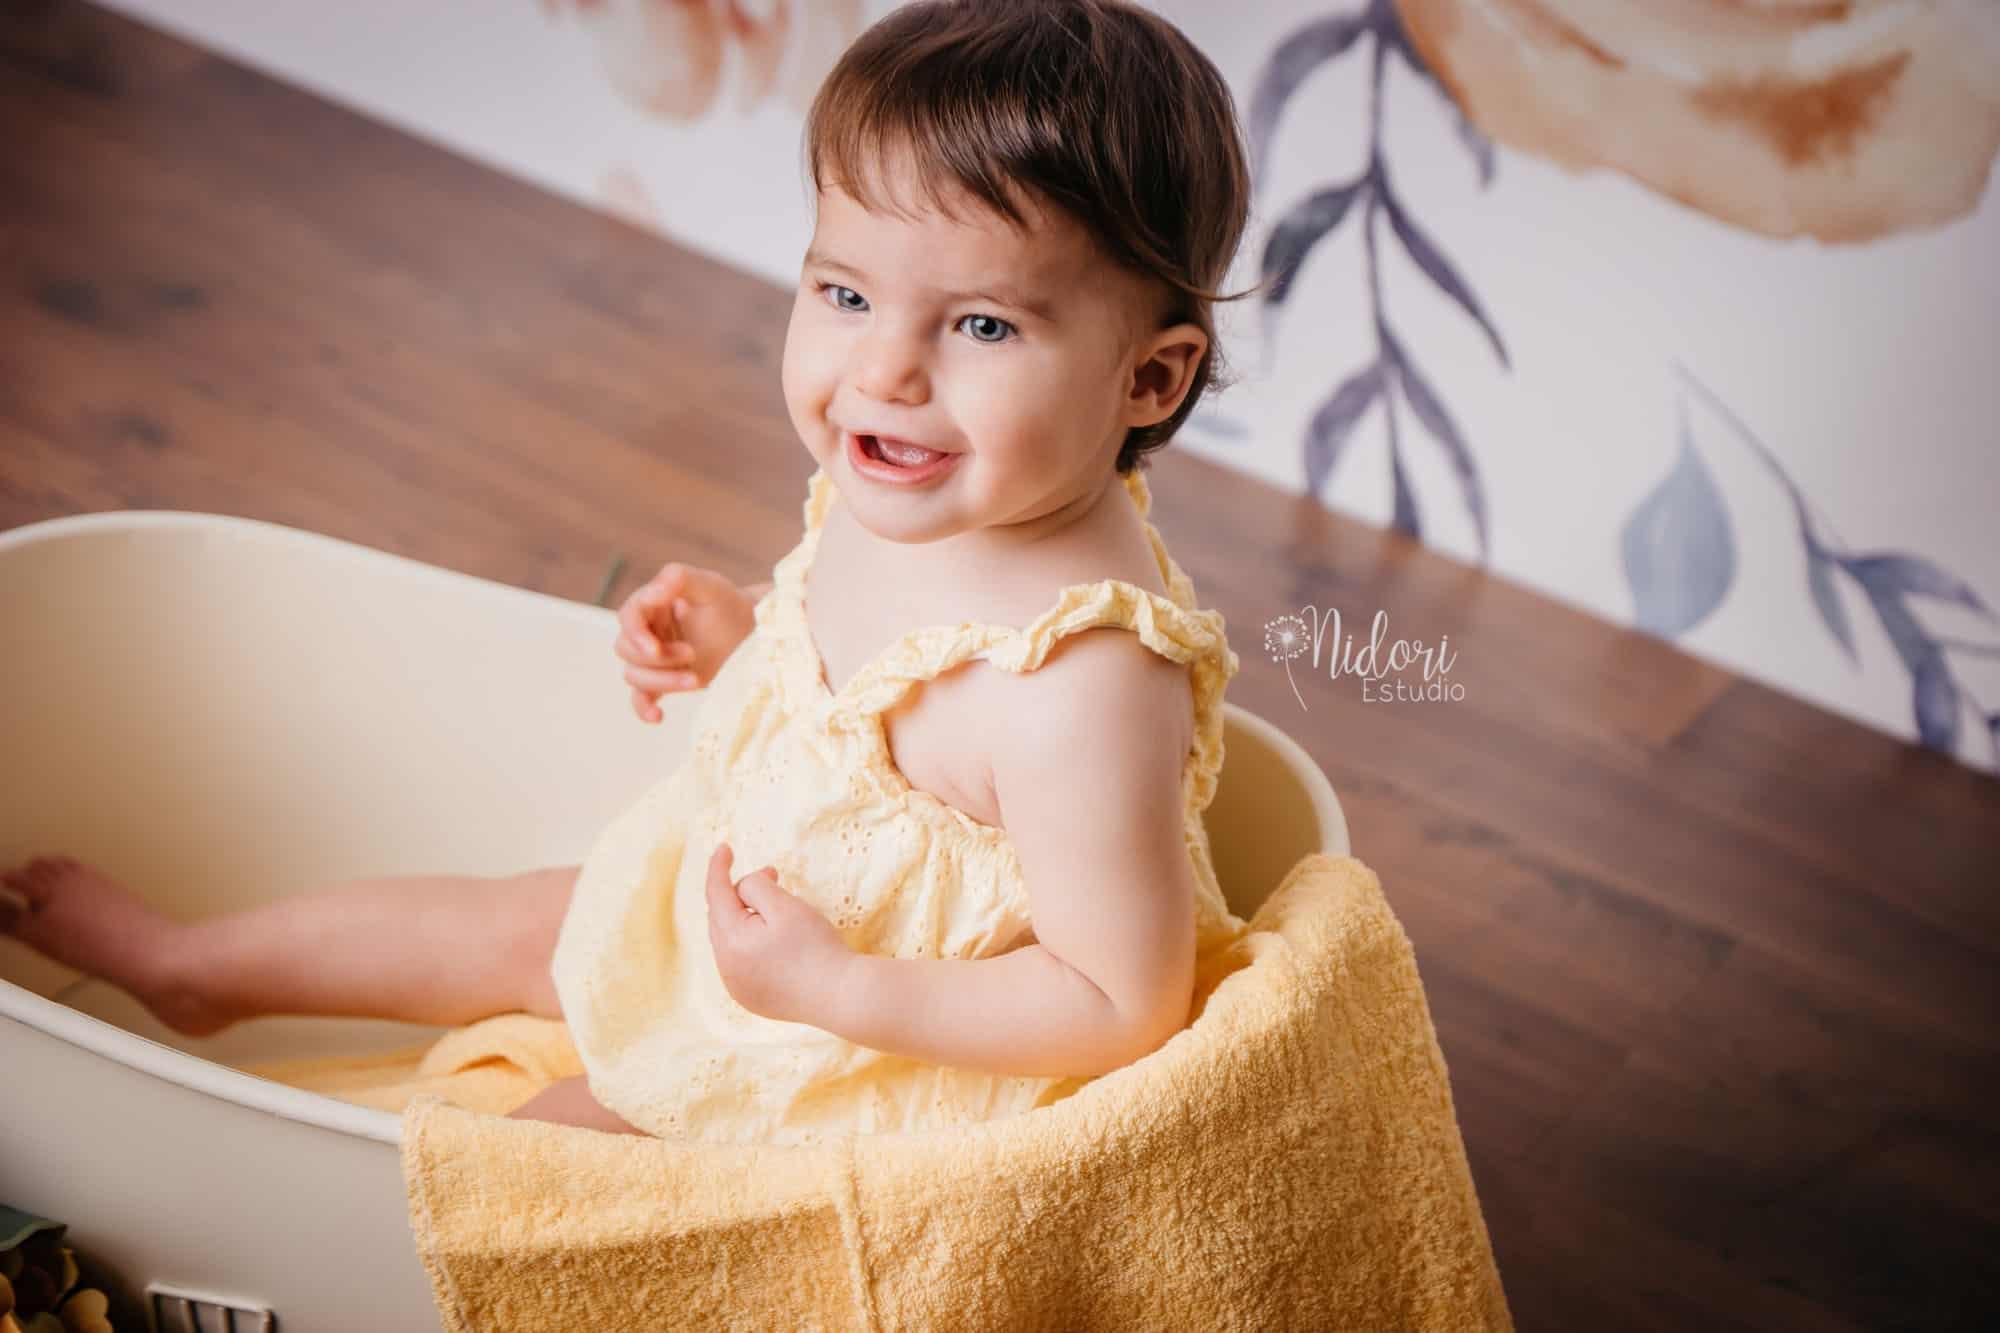 seguimiento-fotografia-niños-bebes-nidoriestudio-fotos-valencia-almazora-castellon-españa-spain-14